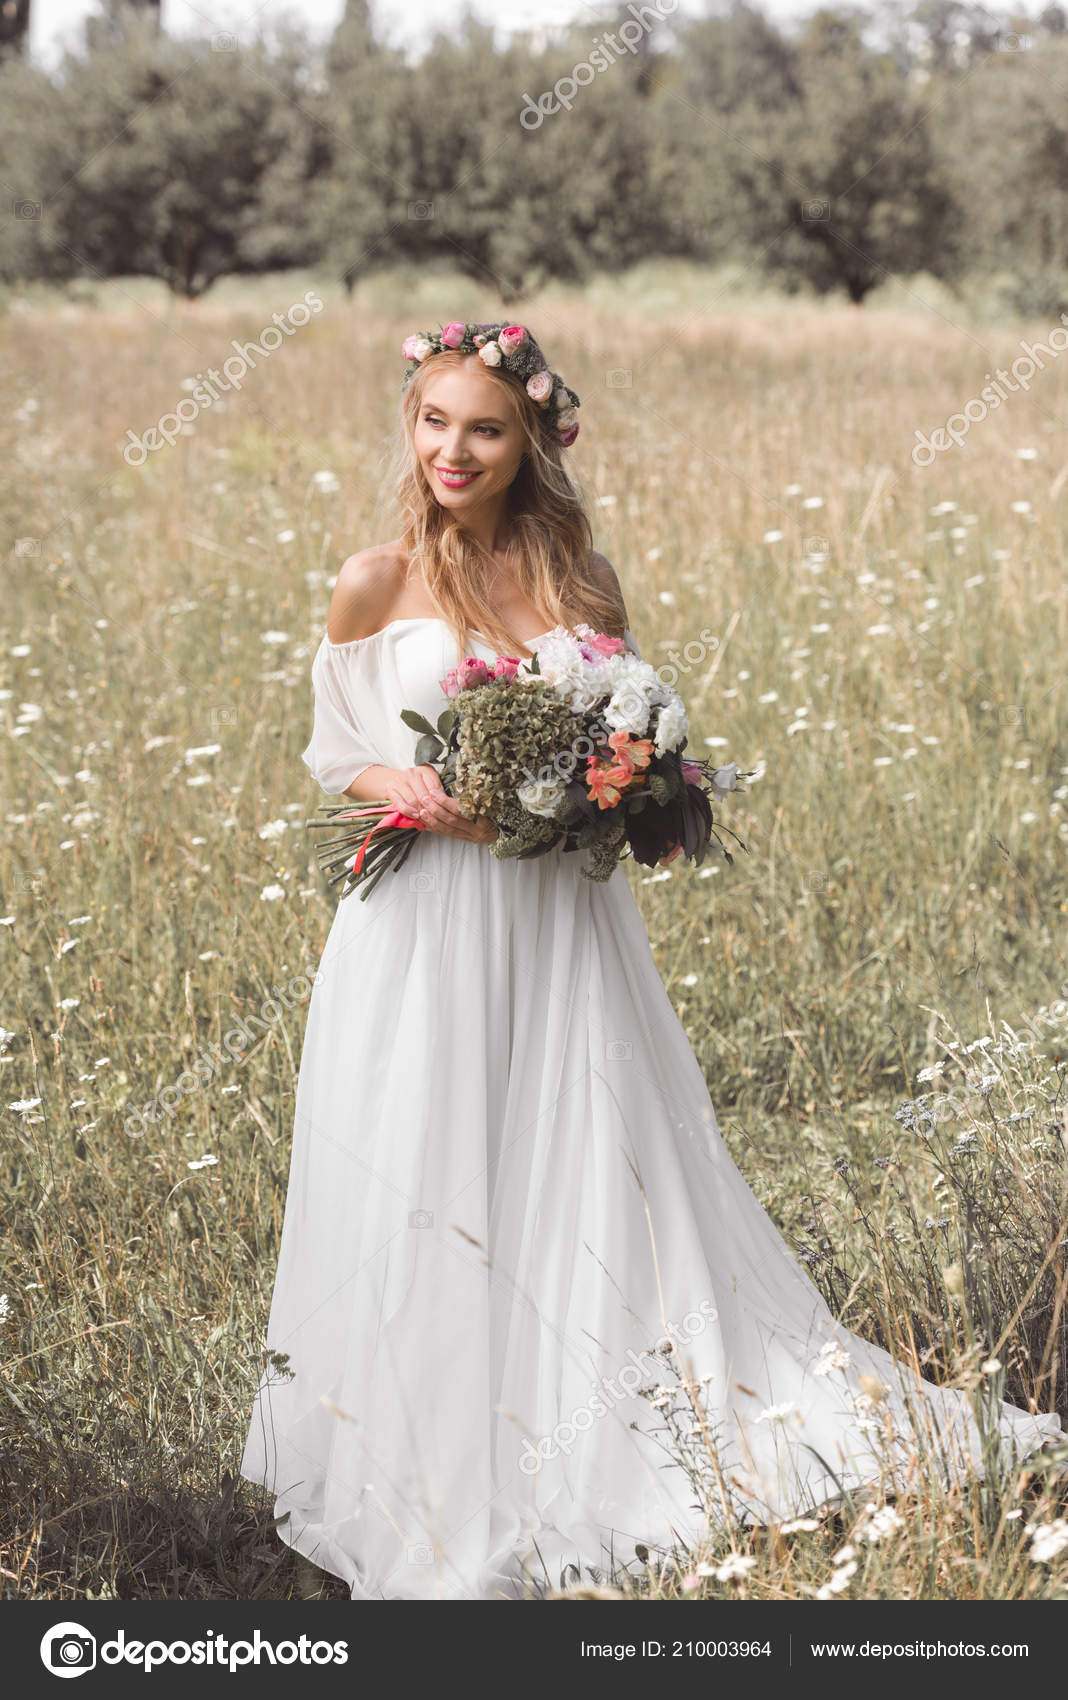 Vue Angle Eleve Belle Souriante Jeune Mariee Couronne Florale Robe